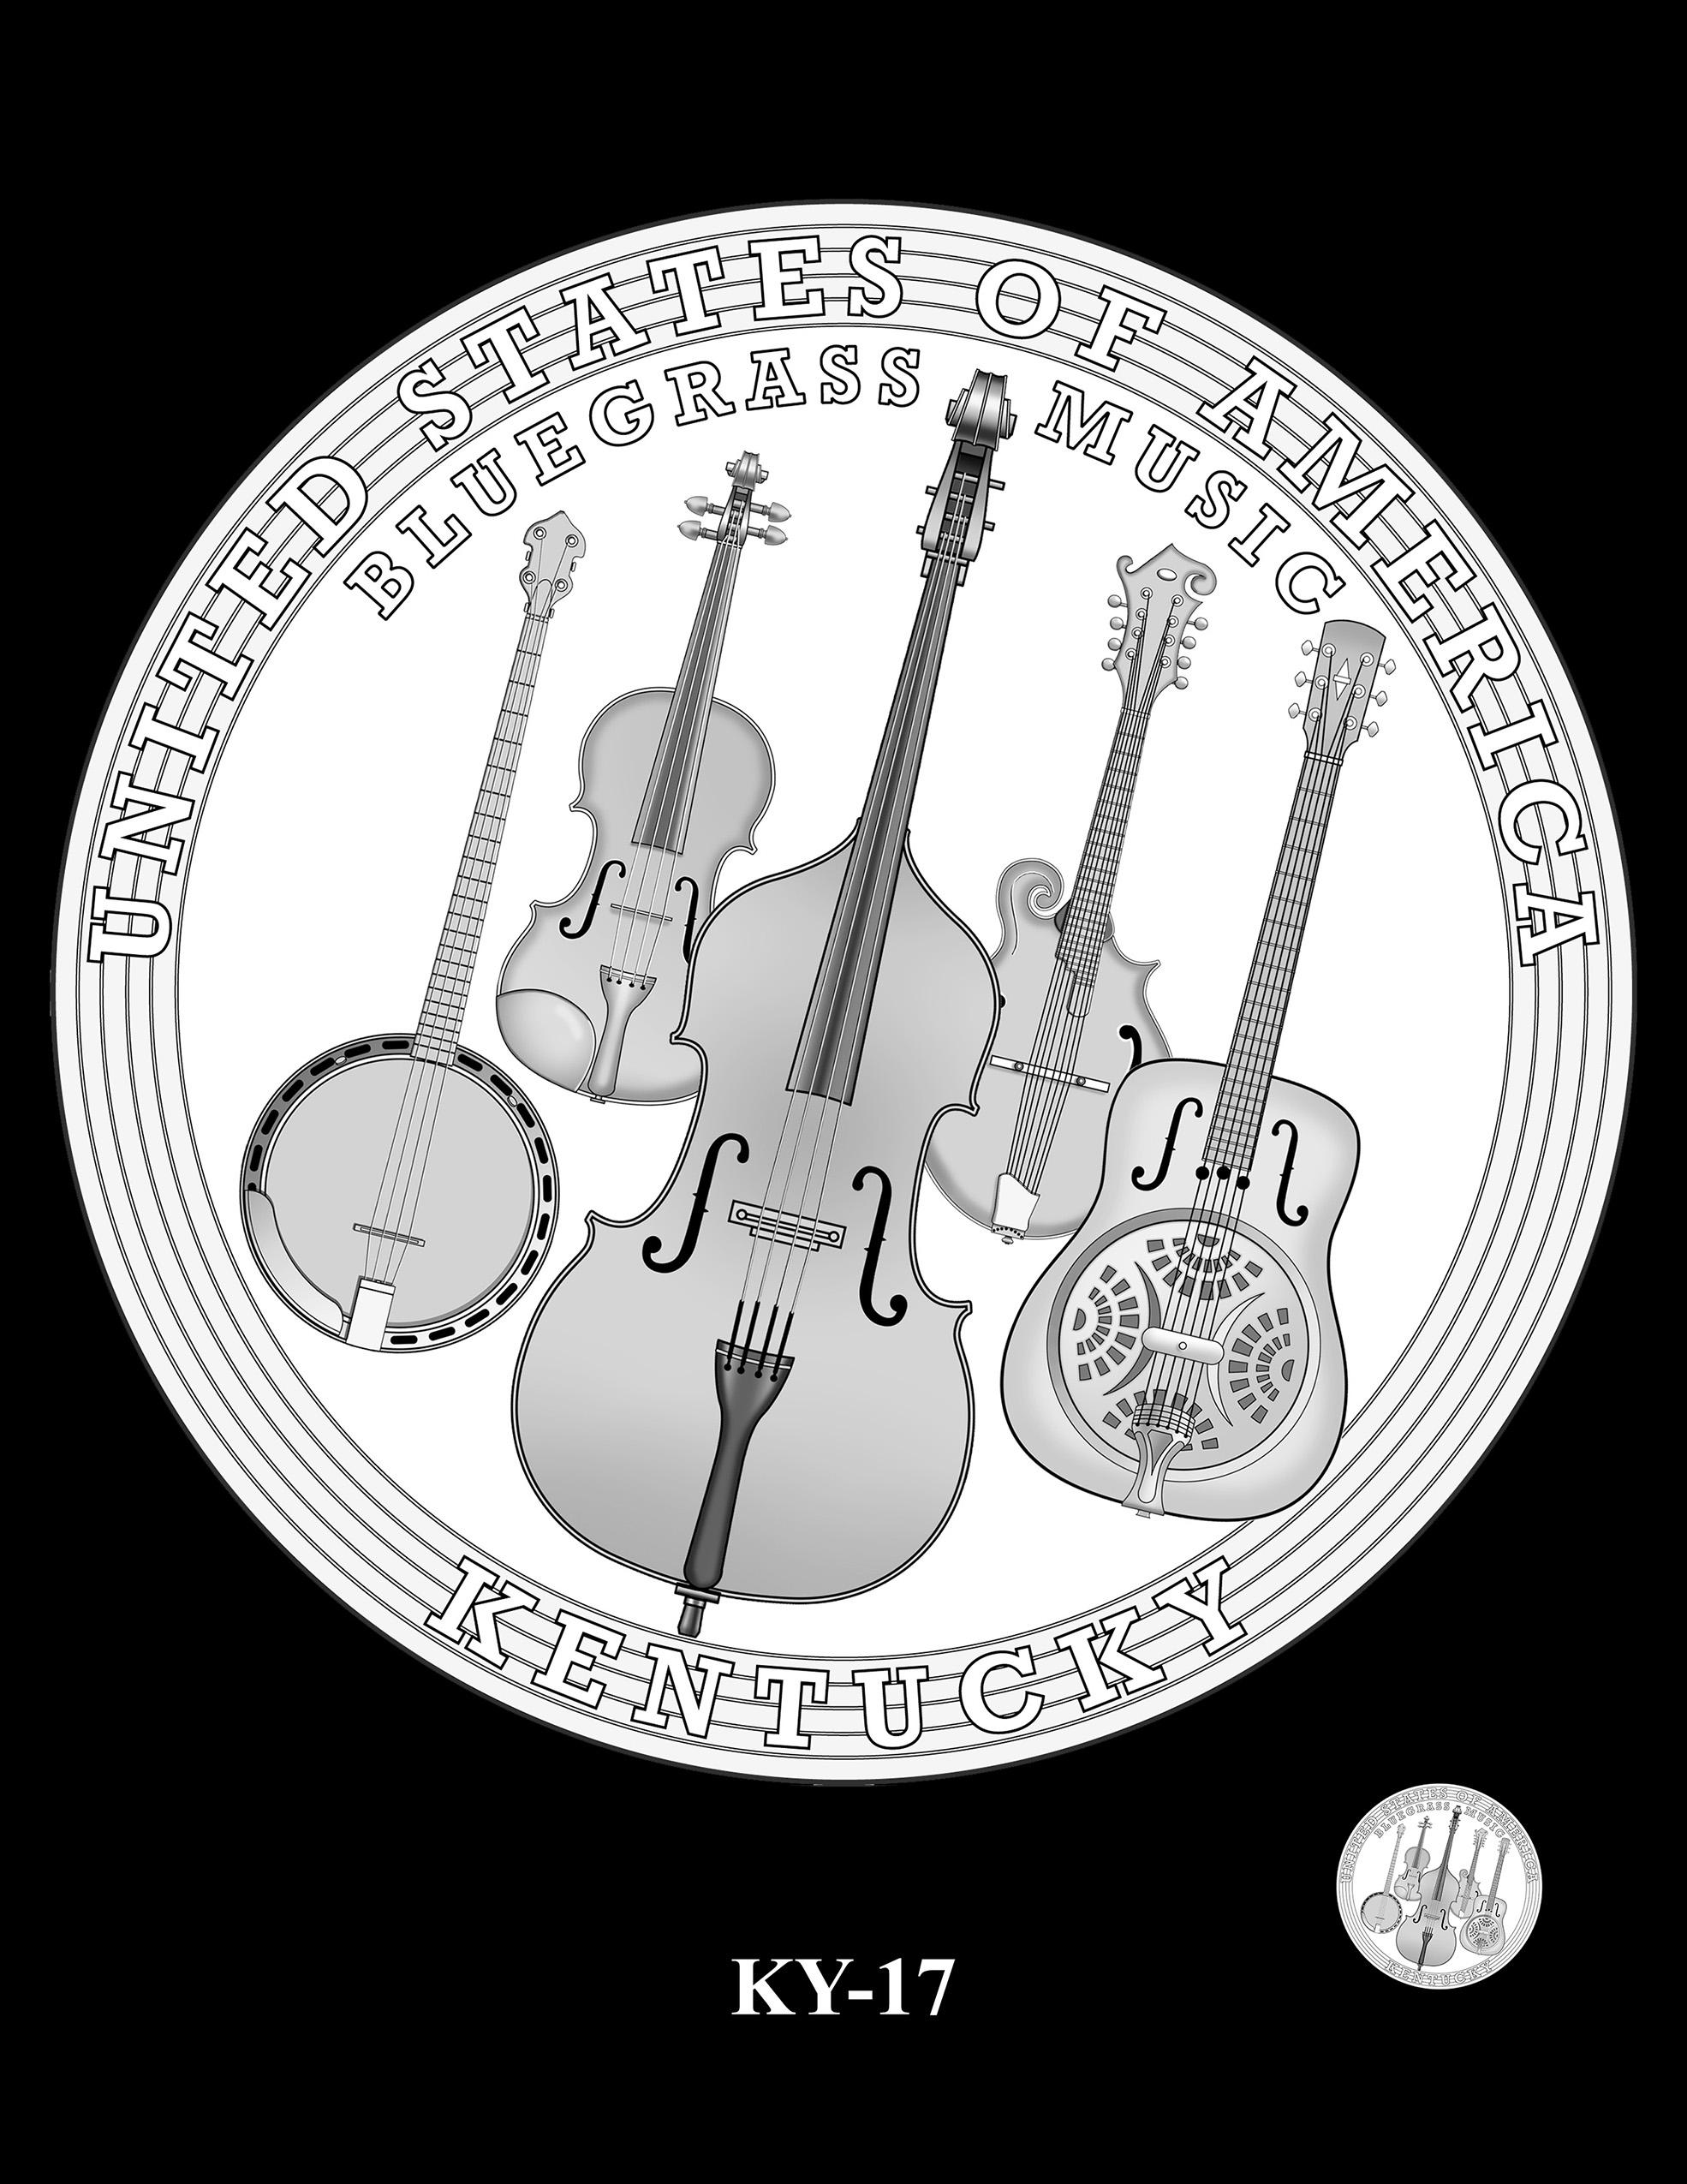 KY-17 -- 2022 American Innovation $1 Coin - Kentucky